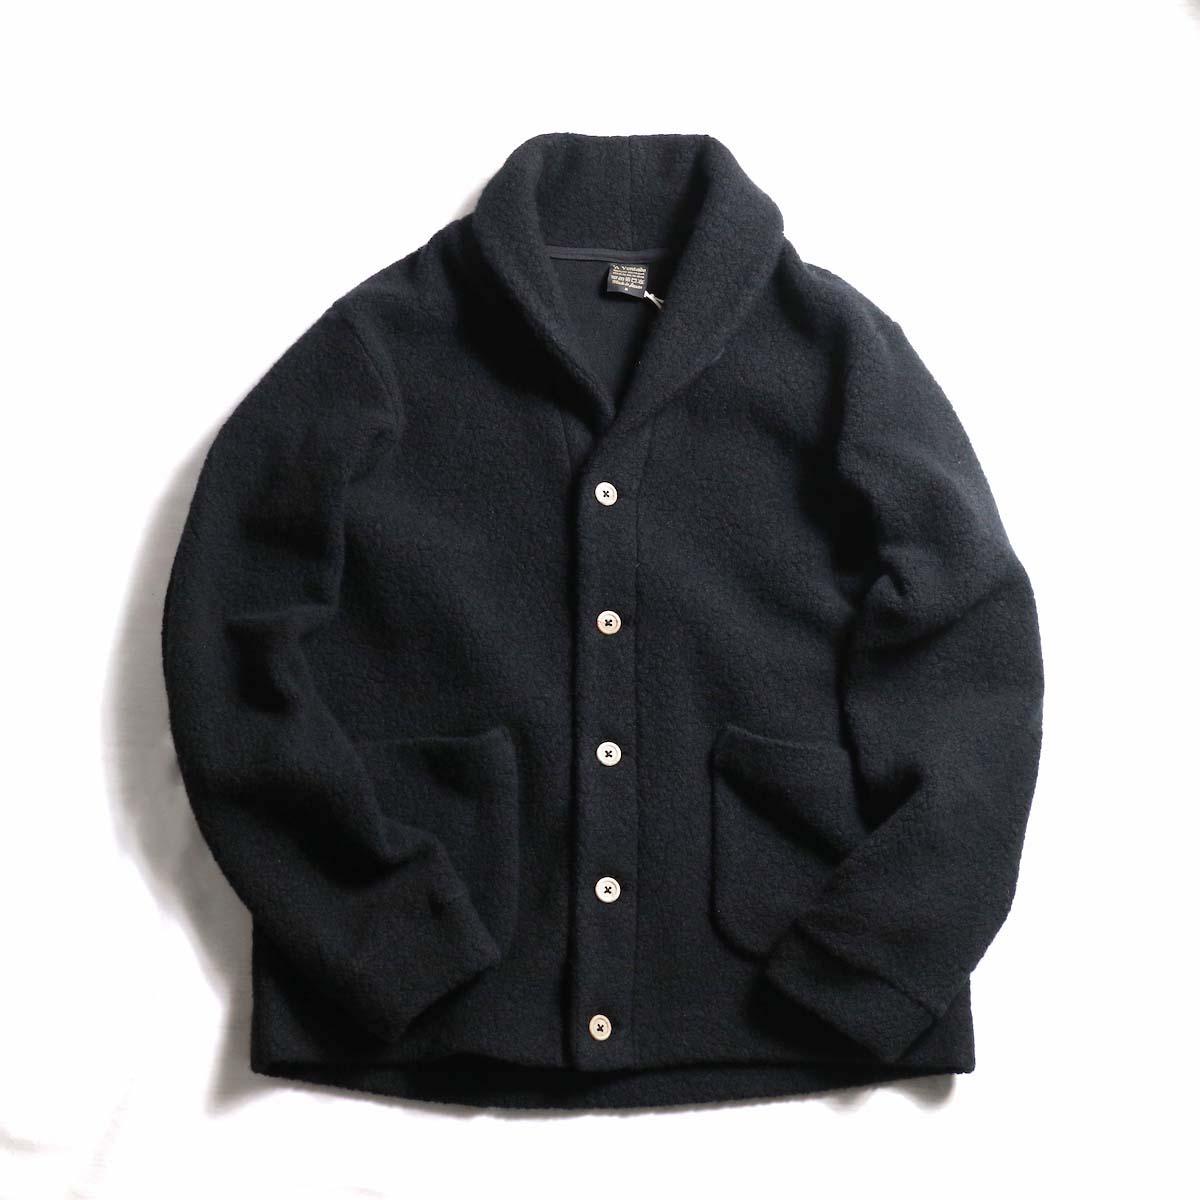 A VONTADE / Wool Pile Shawl Collar Cardigan -Black